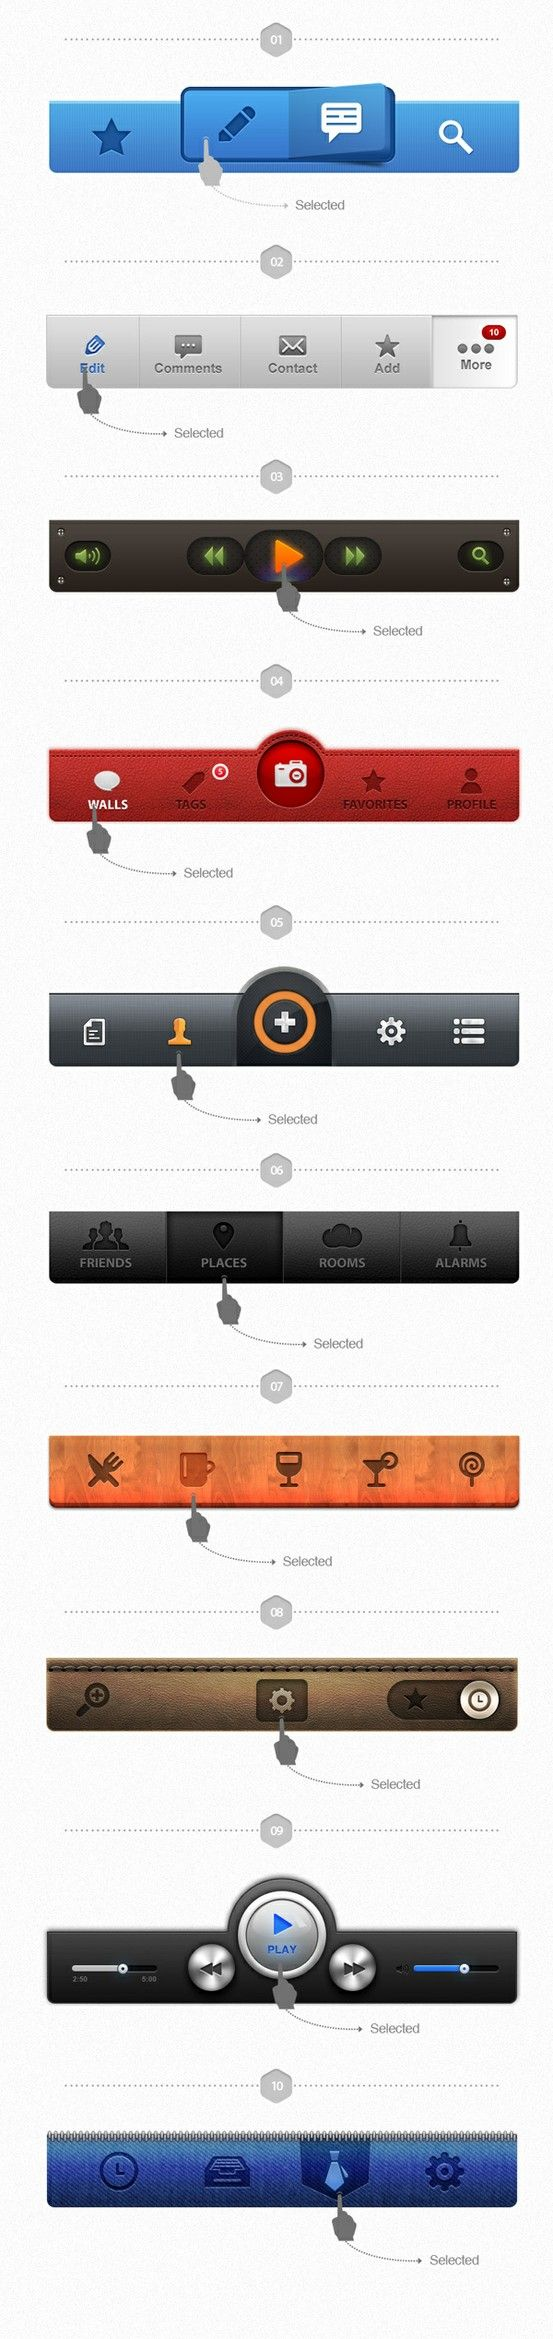 Mobile UI elements